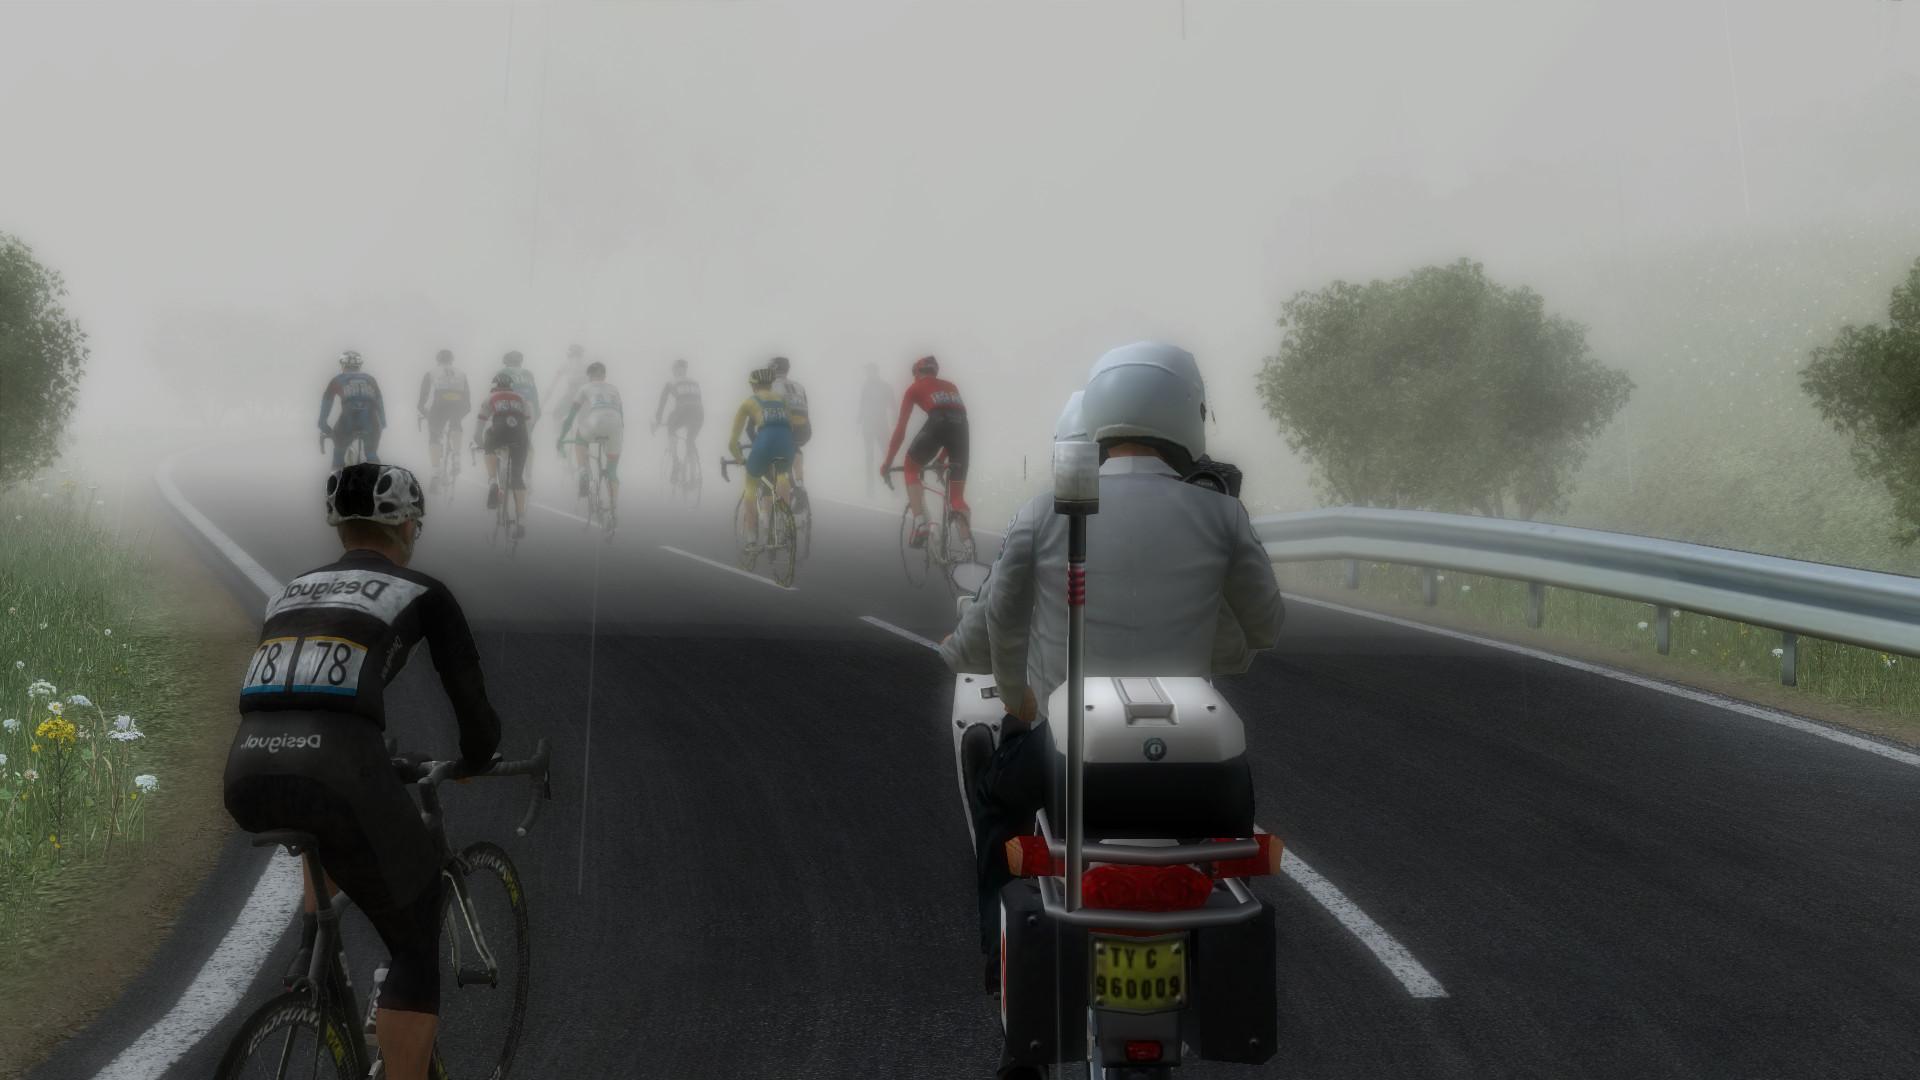 pcmdaily.com/images/mg/2019/Races/PTHC/Pologne/E5/10.jpg